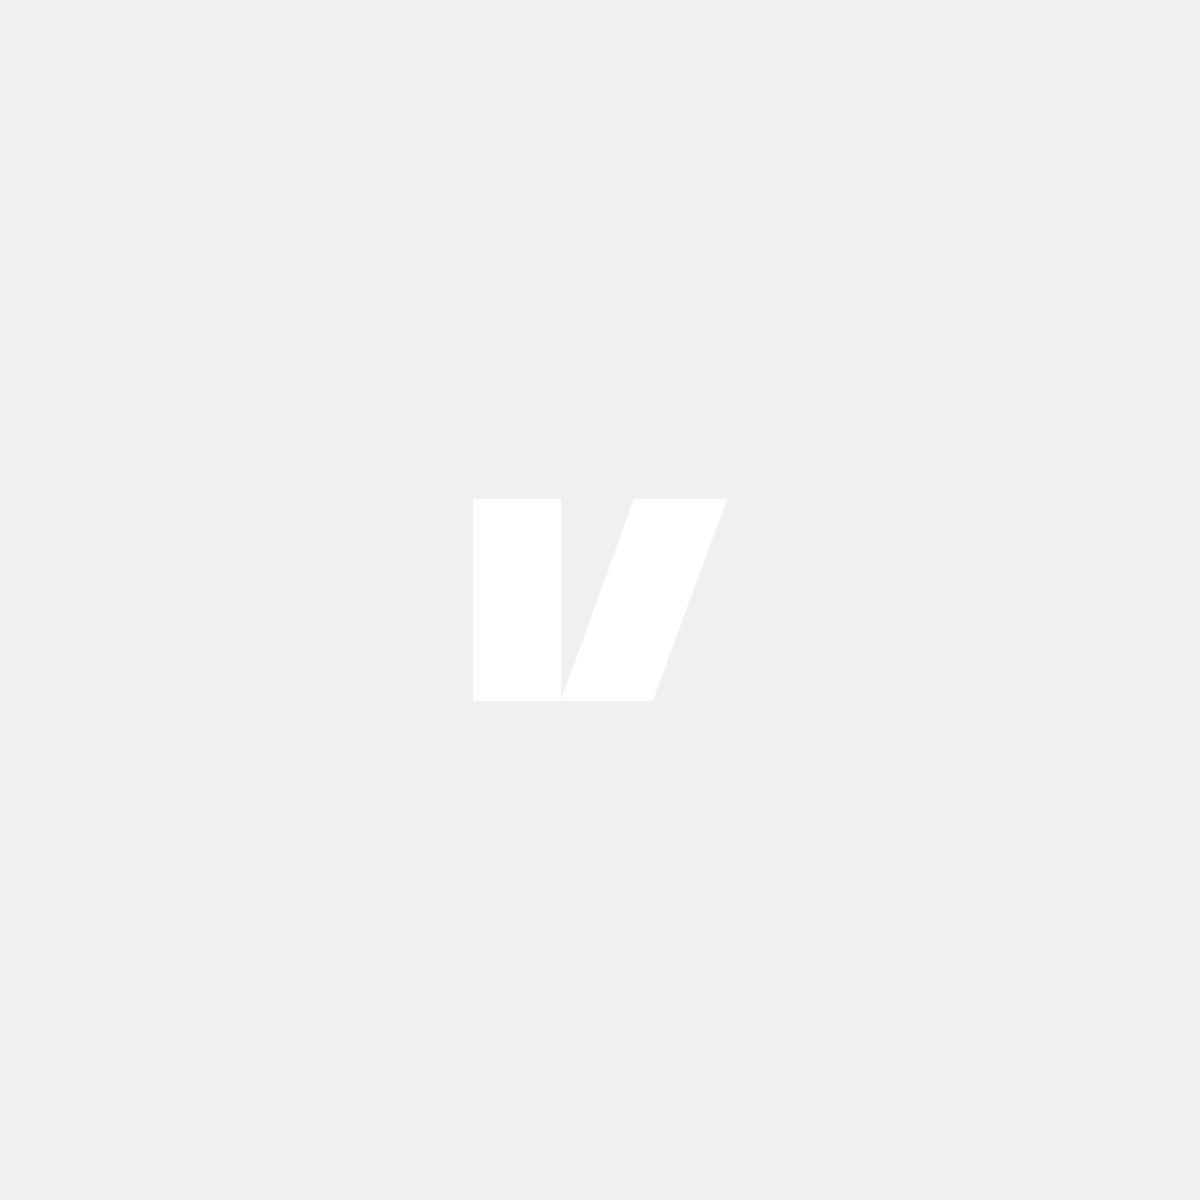 Ferodo sportbromsbelägg fram till Volvo 740, 760, 780, 940, 960, S90, V90 girling stora